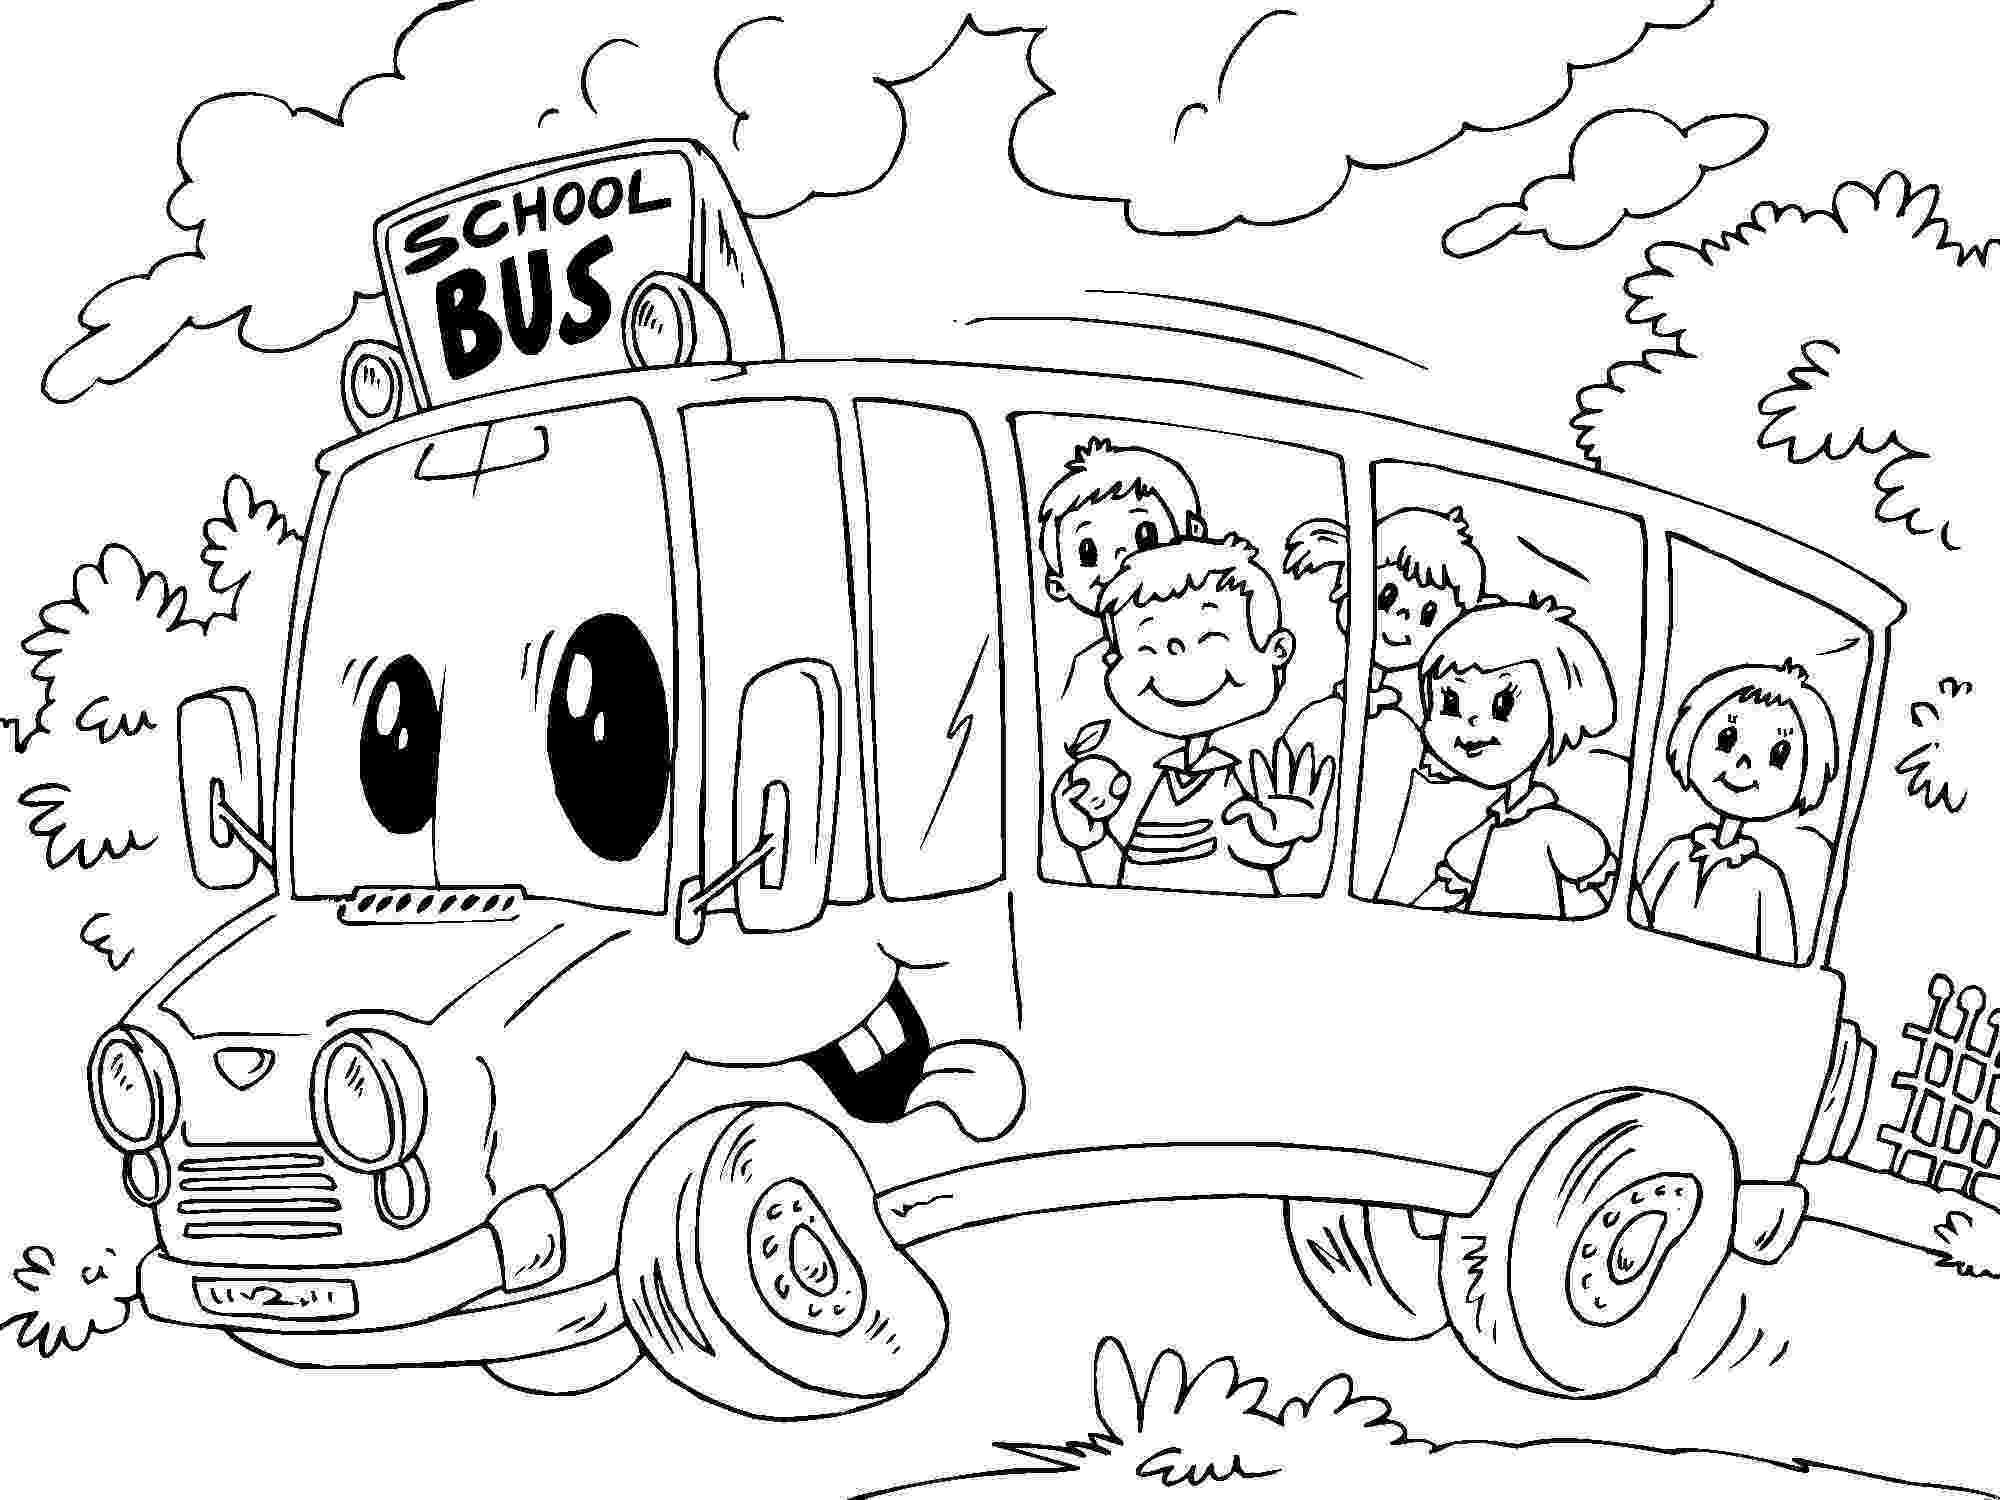 school bus coloring sheet free printable school bus coloring pages for kids coloring sheet bus school